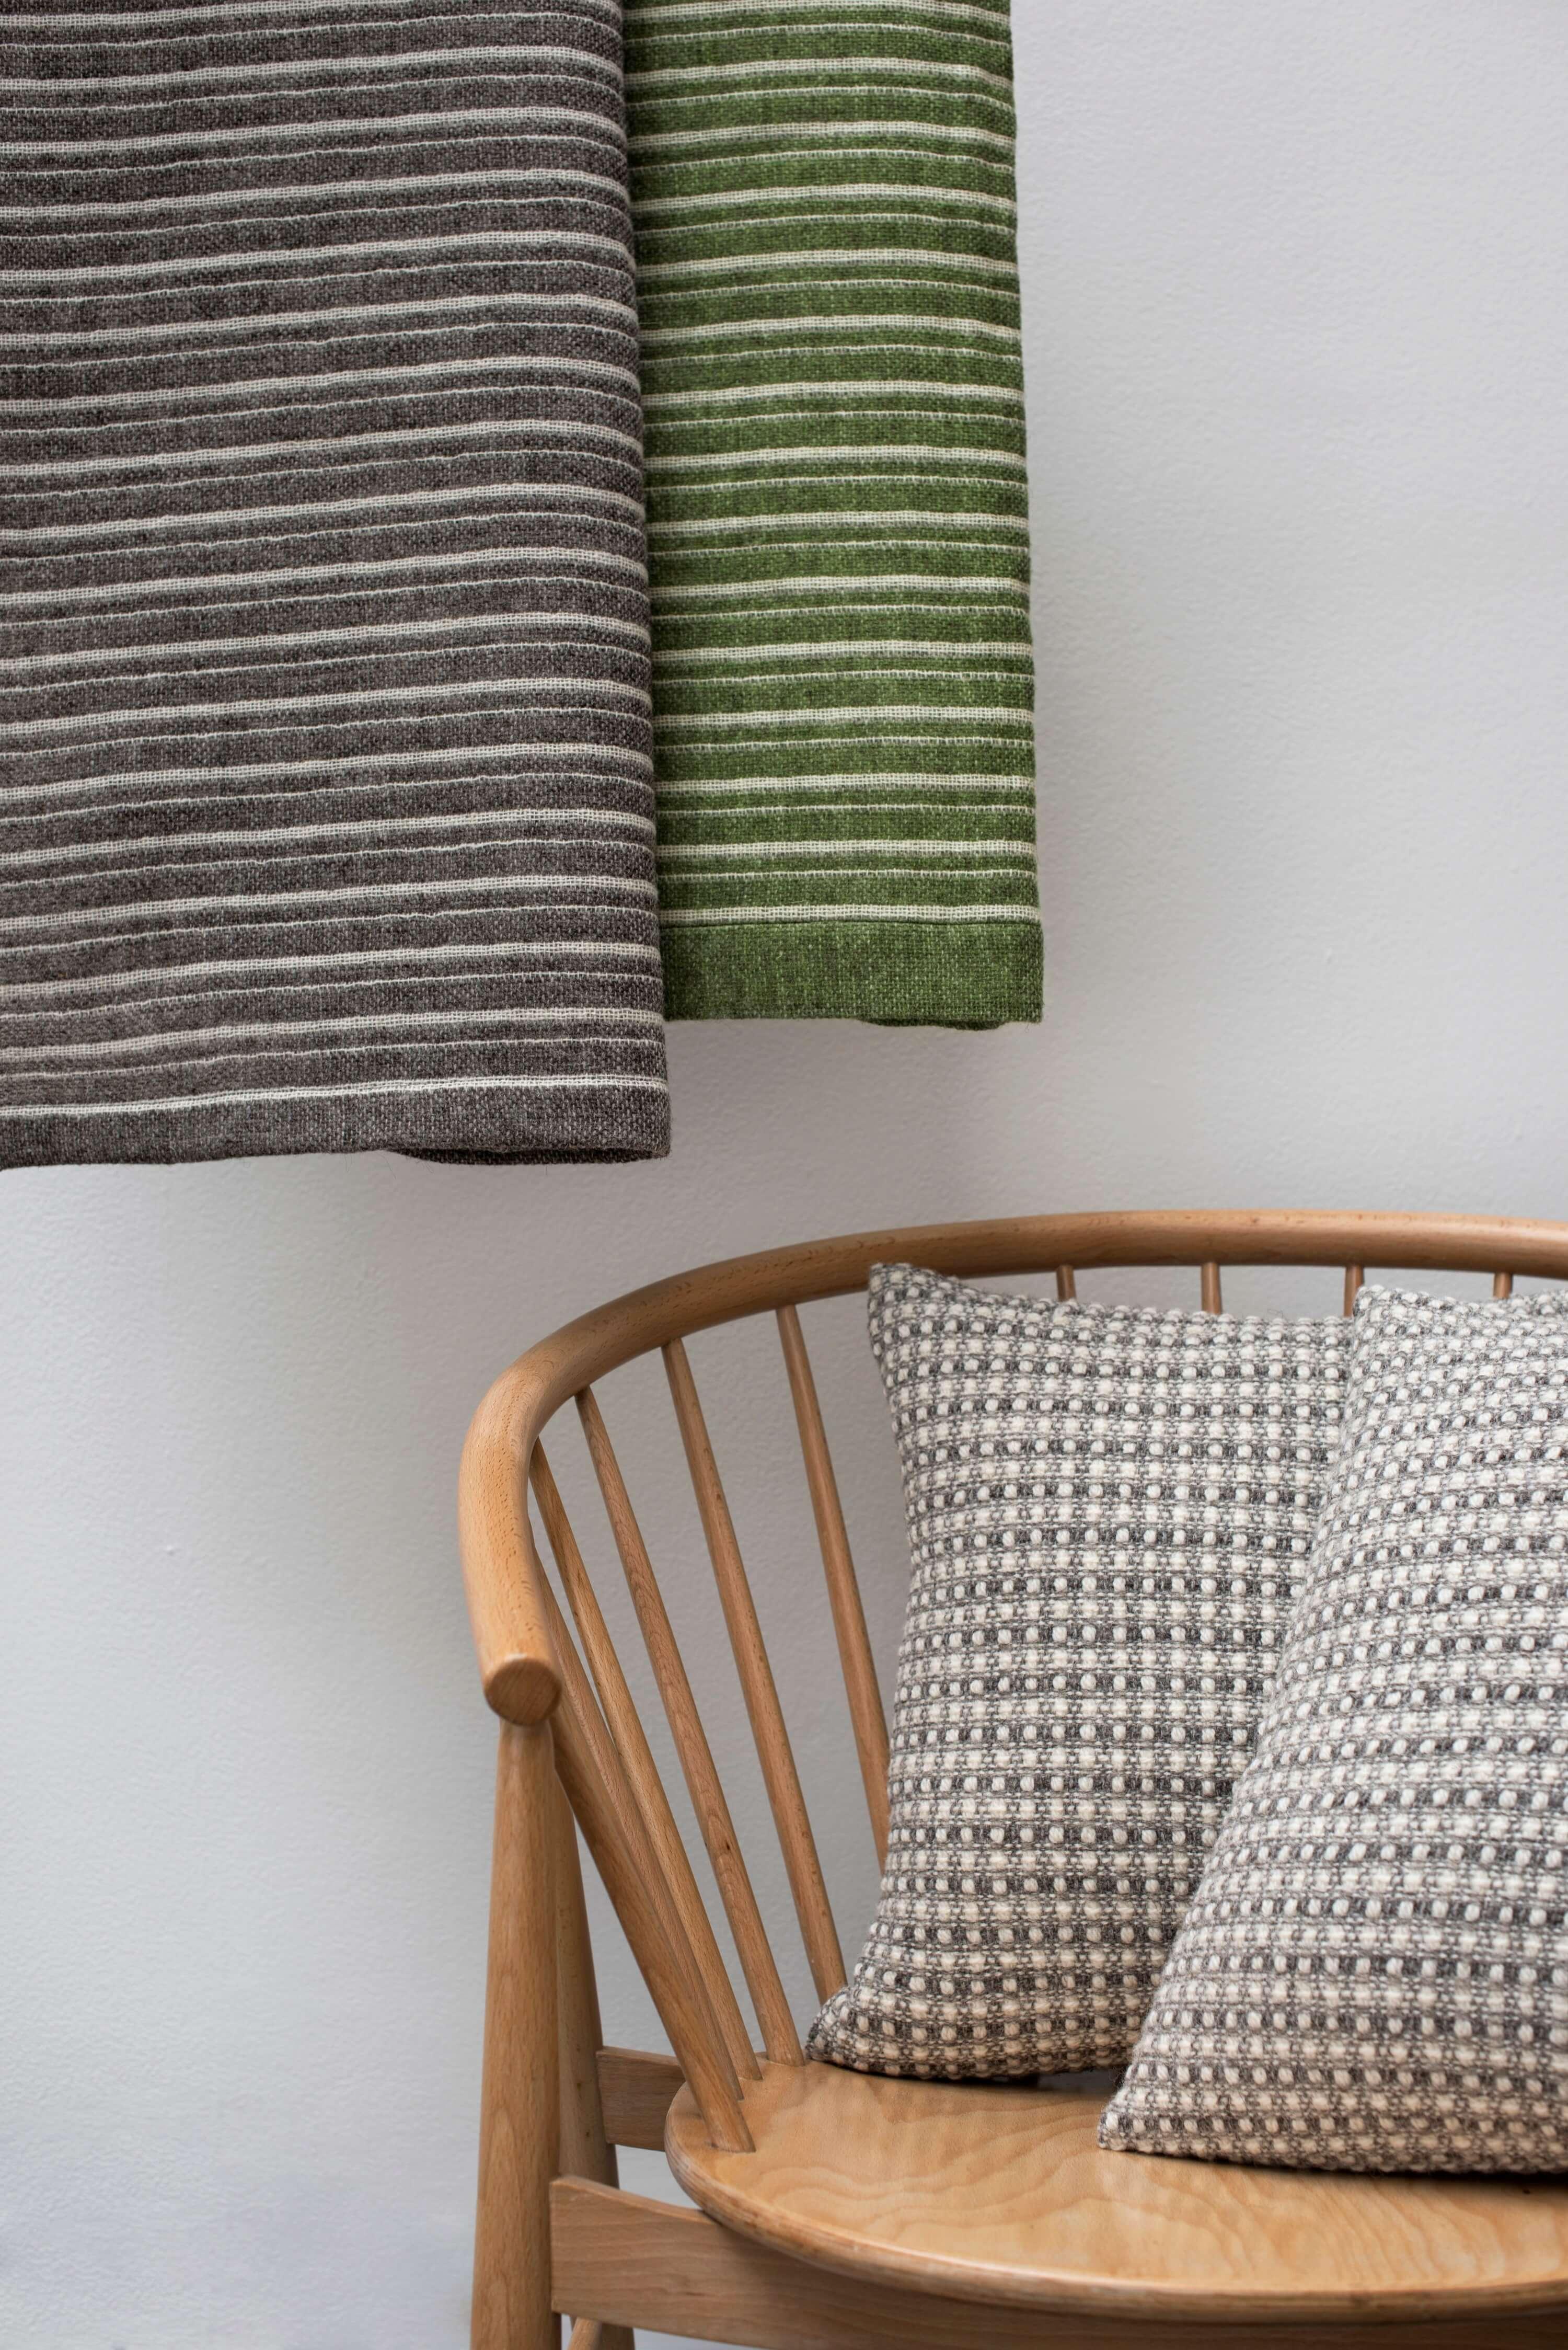 blankets_cushions_3000-colour-corrected